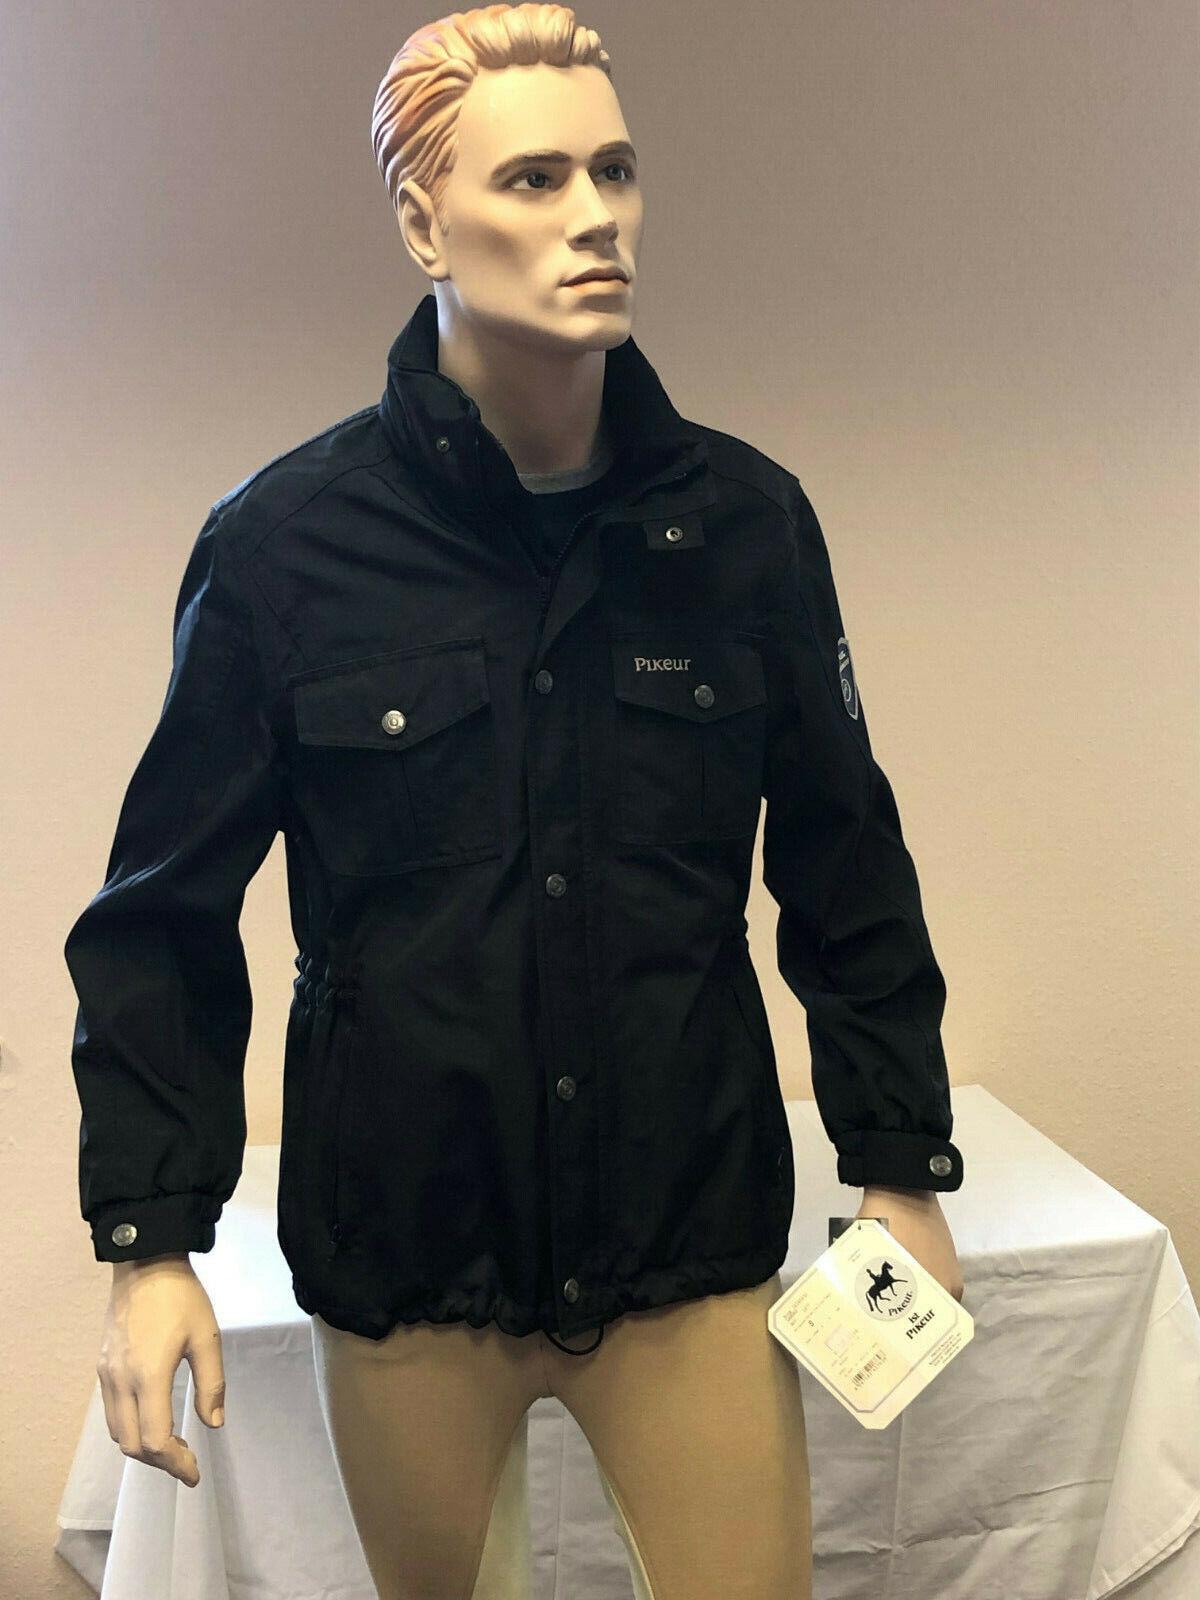 Señores reitjacke chaqueta Landro de Pikeur en negro